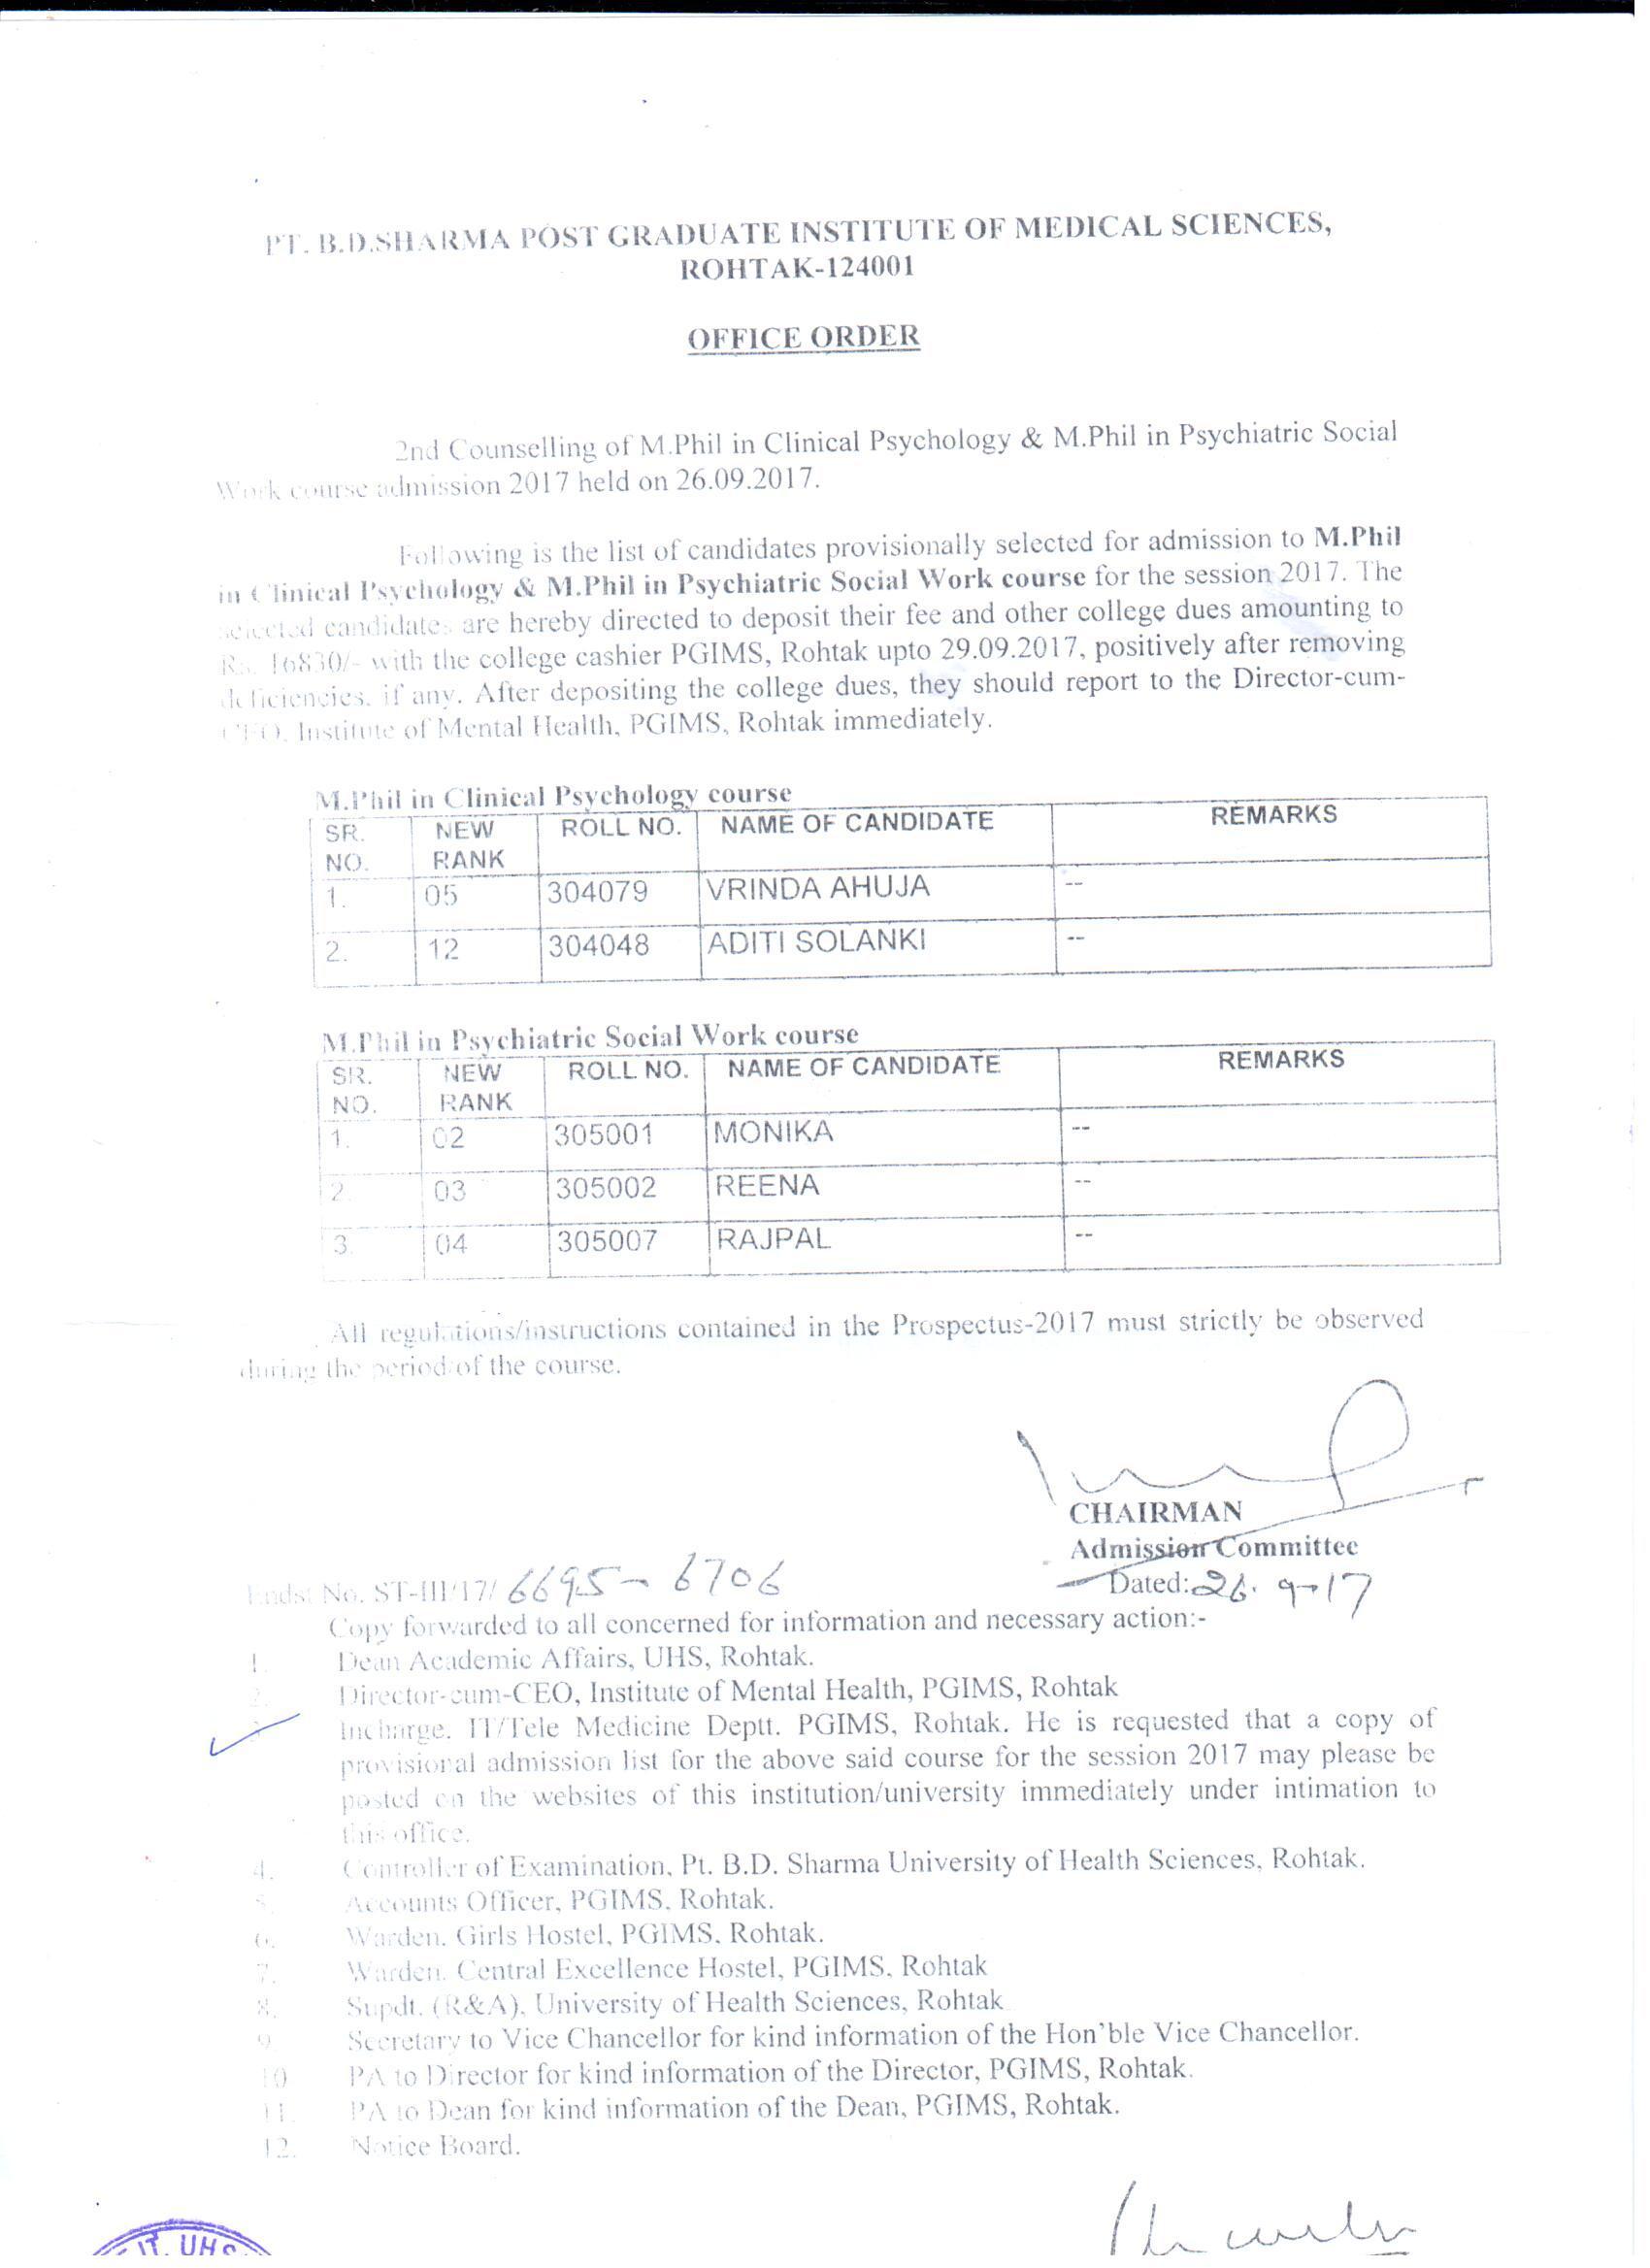 PT BHAGWAT DAYAL SHARMA POST GRADUATE INSTITUTE OF MEDICAL